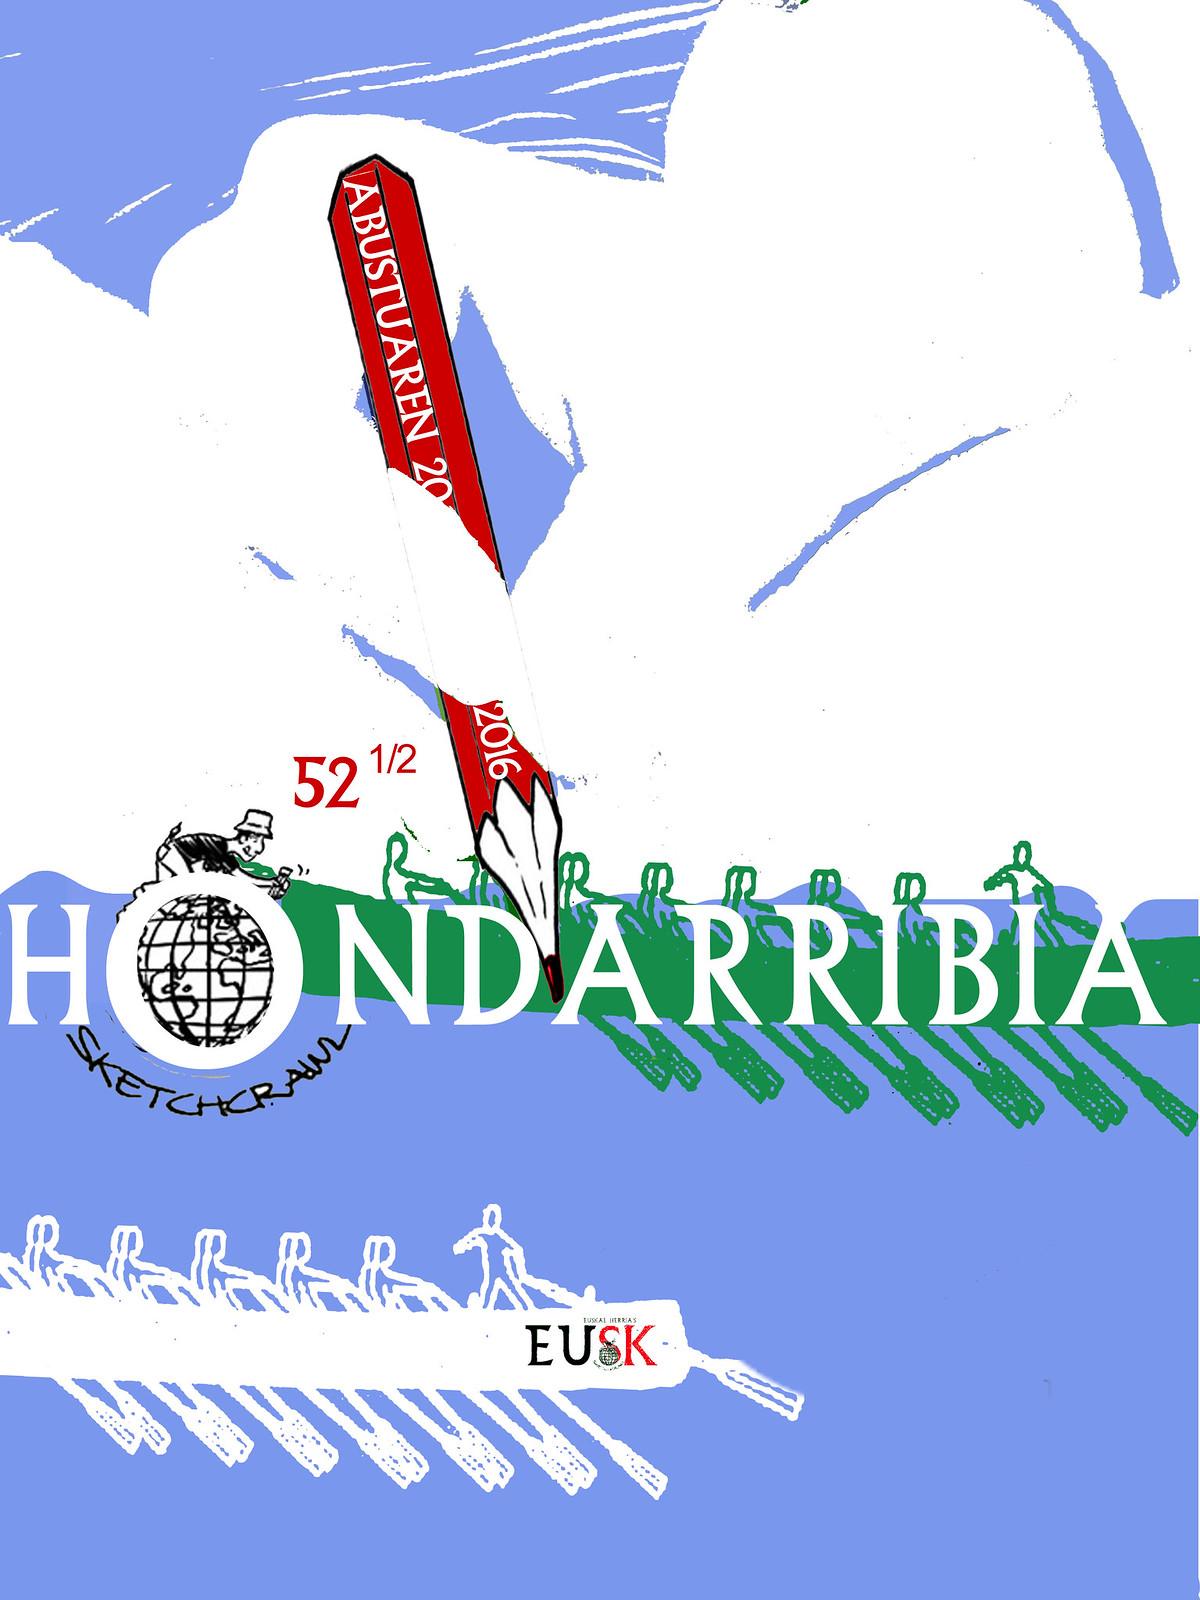 cartel hondarribia 52 1/2 SketchCrawl